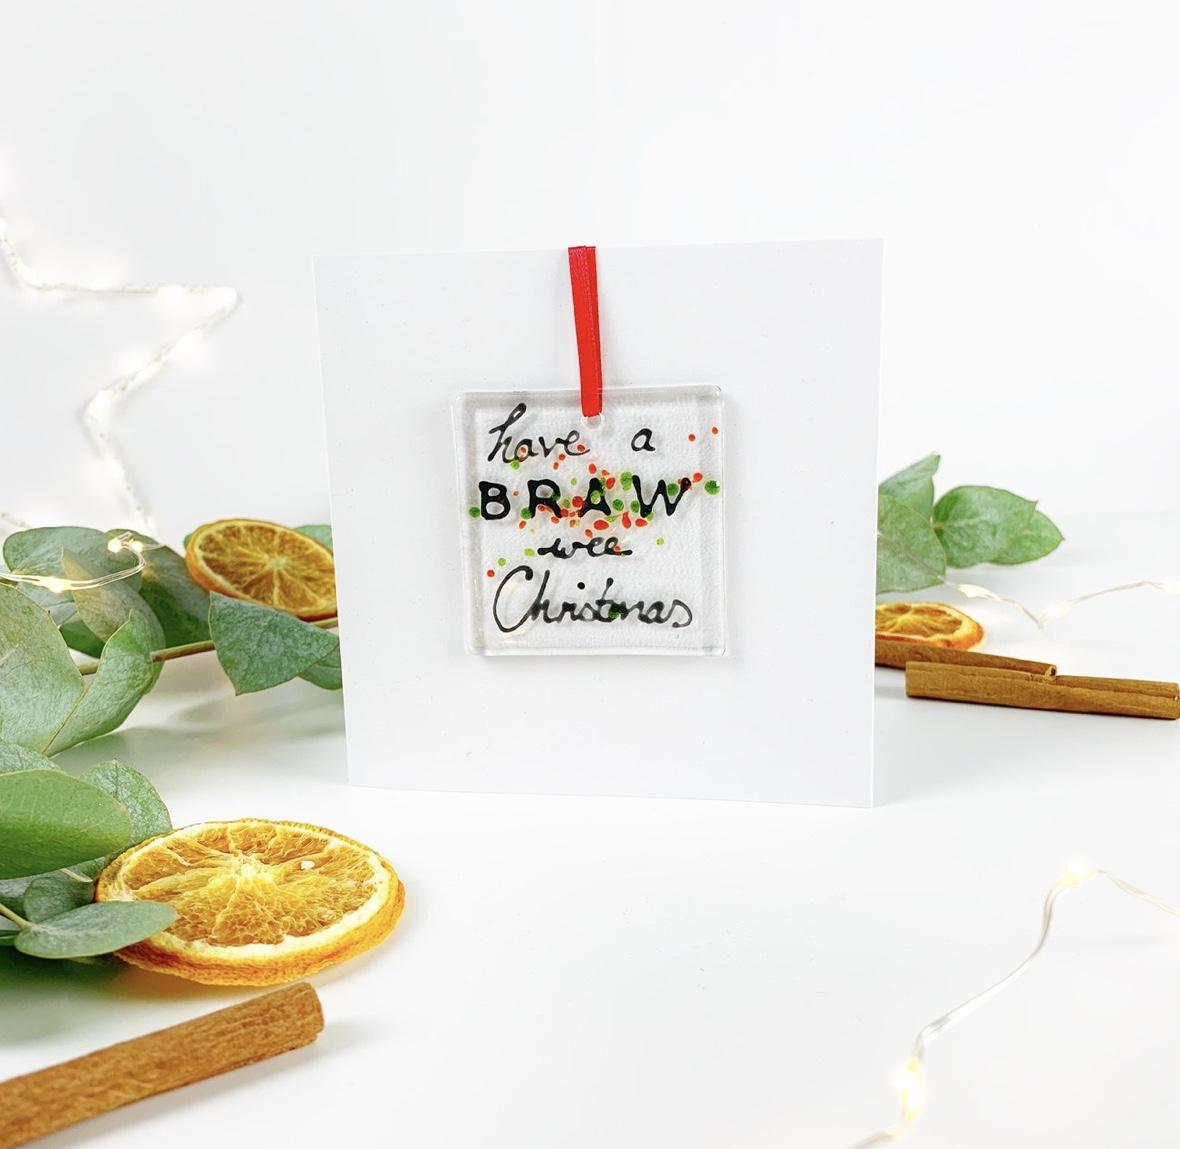 Braw Christmas Card